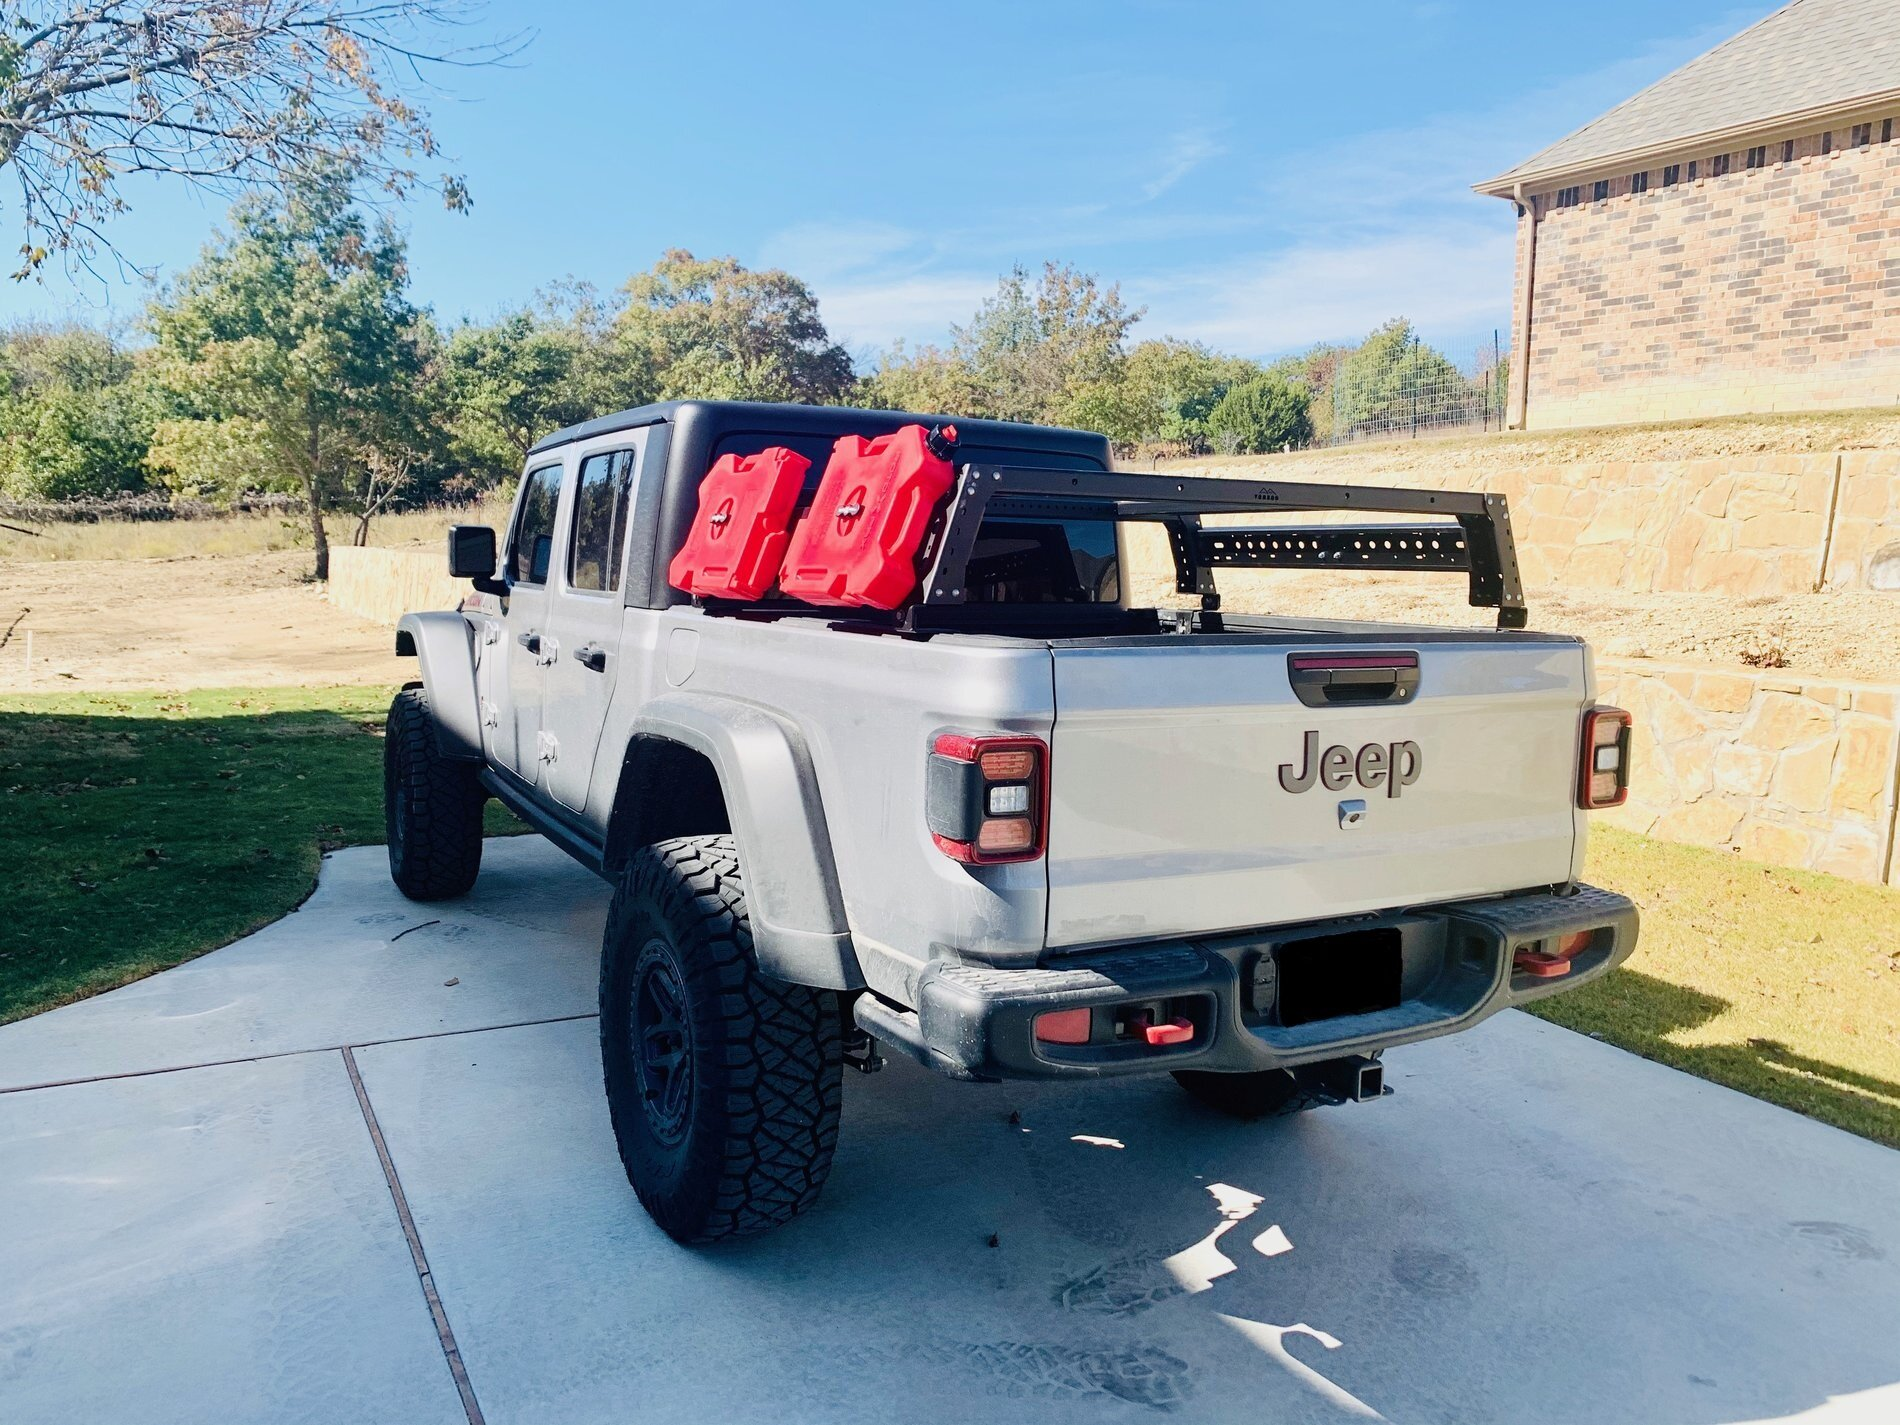 max modular gladiator max steel bed rack fits 2019 and up jeep gladiators max modular truck bed racks